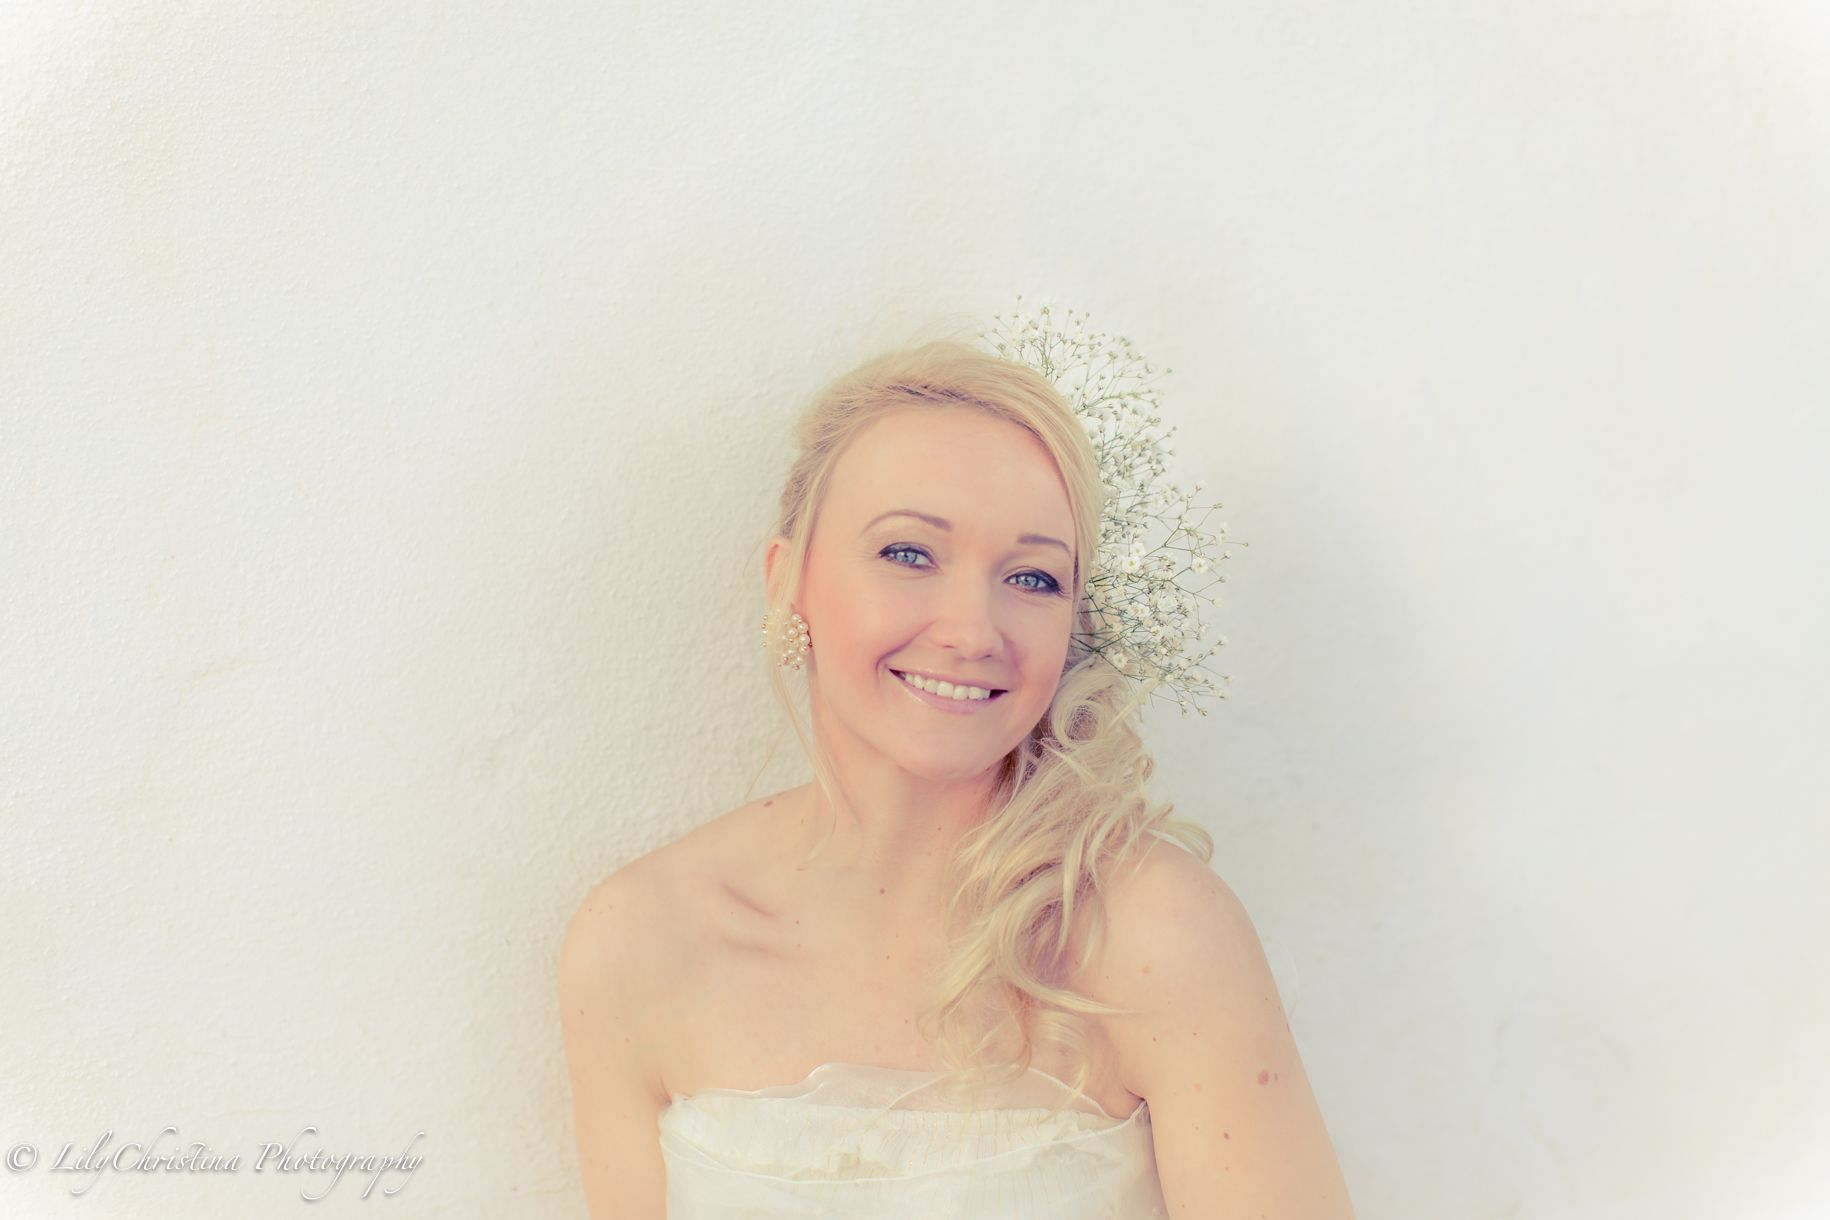 lilychristina, lilychristina photography, fashion portraits, portraits, finnish photographer, wedding photographer, wedding photographer porvoo